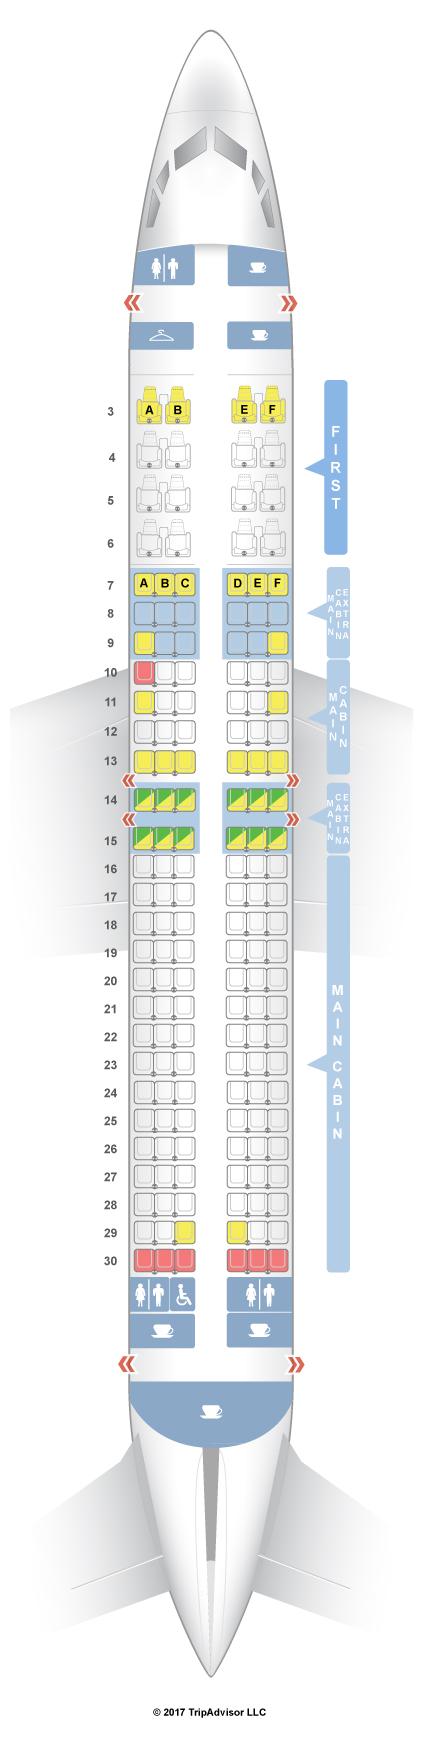 seatguru seat map american airlines boeing 737 800 738 v2